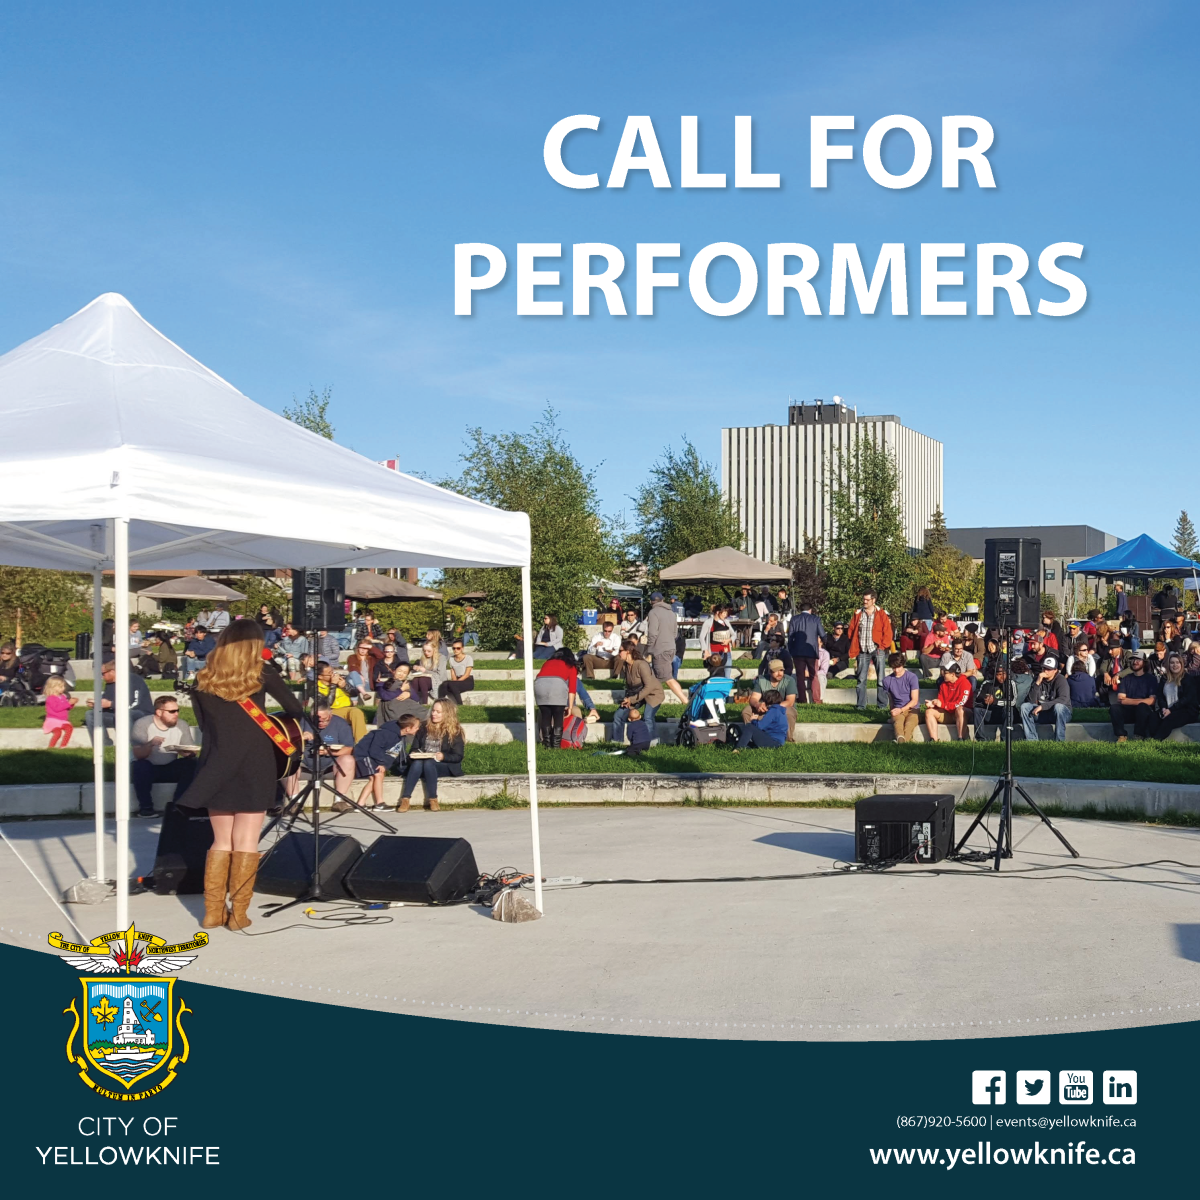 Media Advisory: Call for Performers